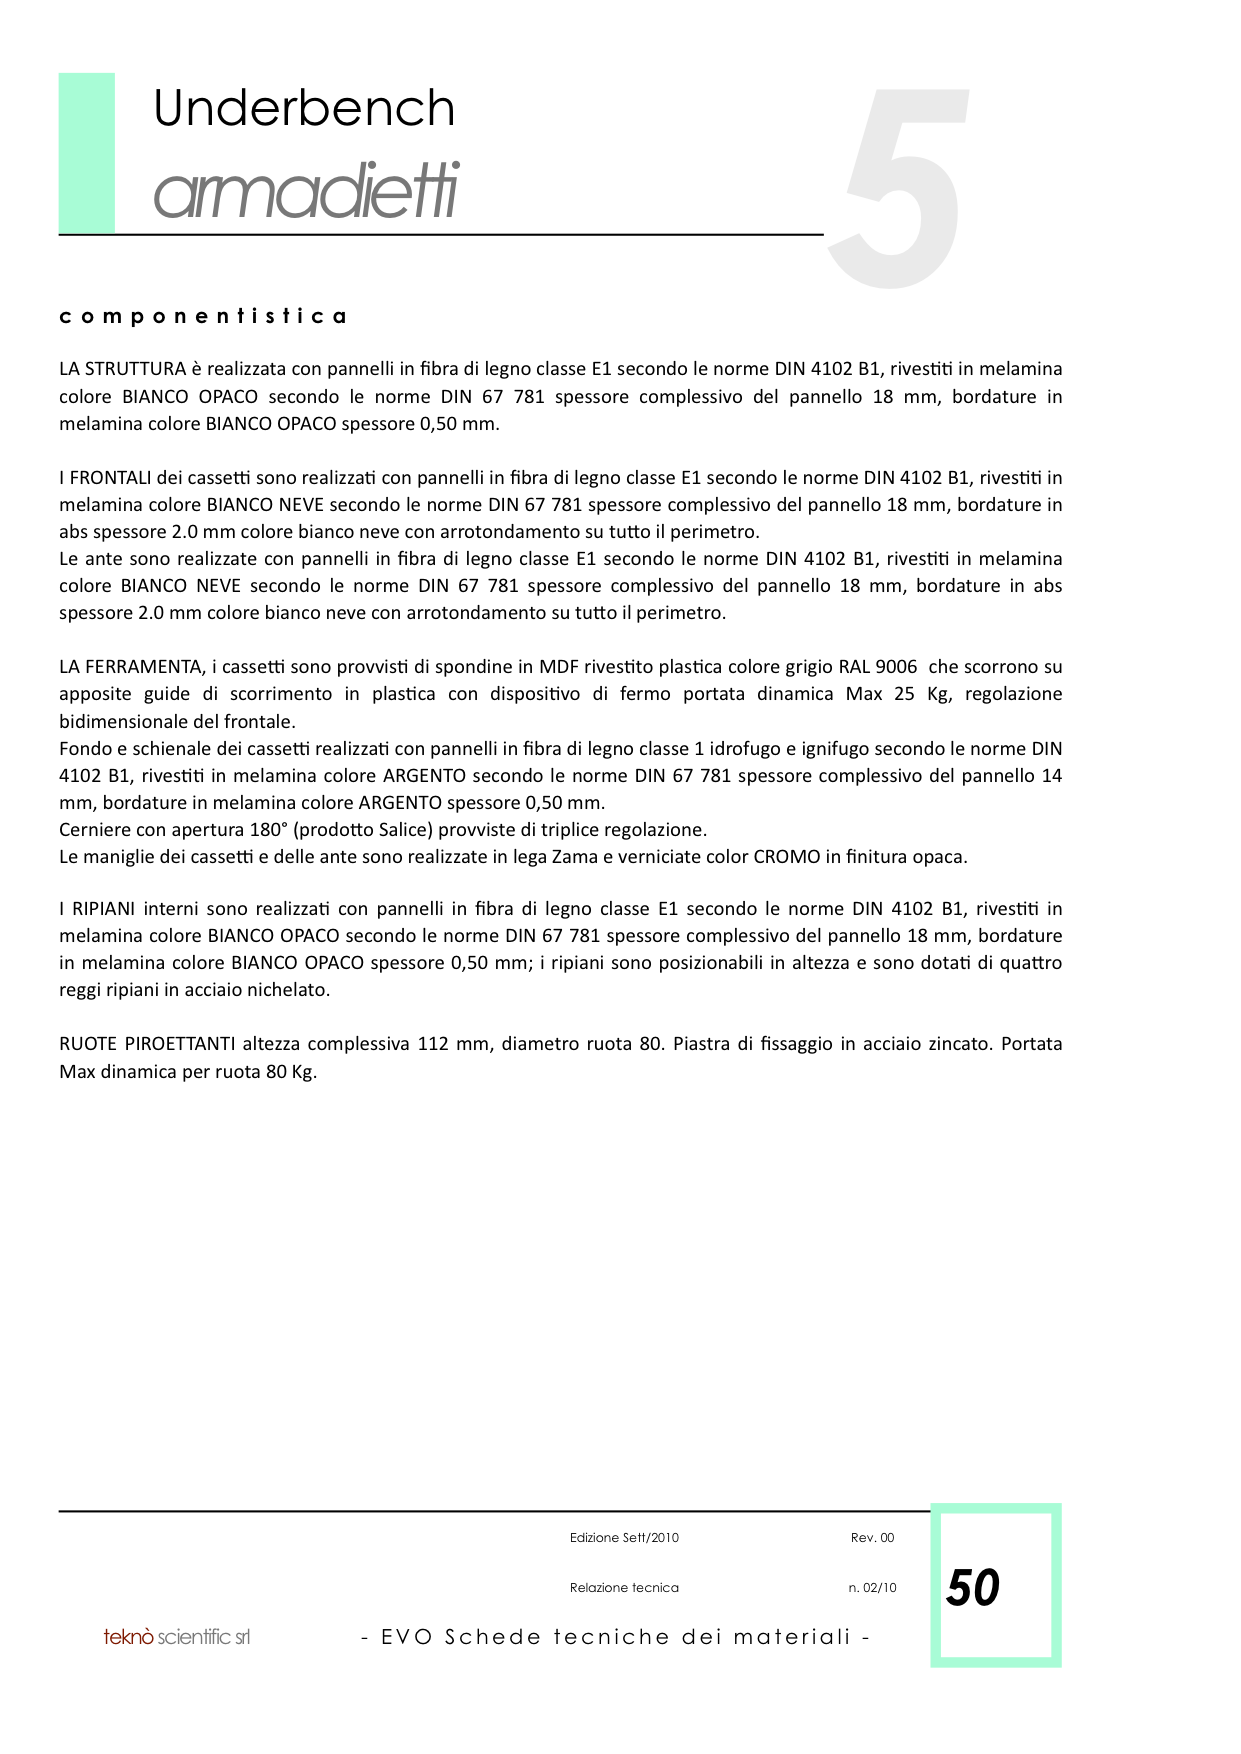 EVO Schede Tecniche materiali copia 11.png